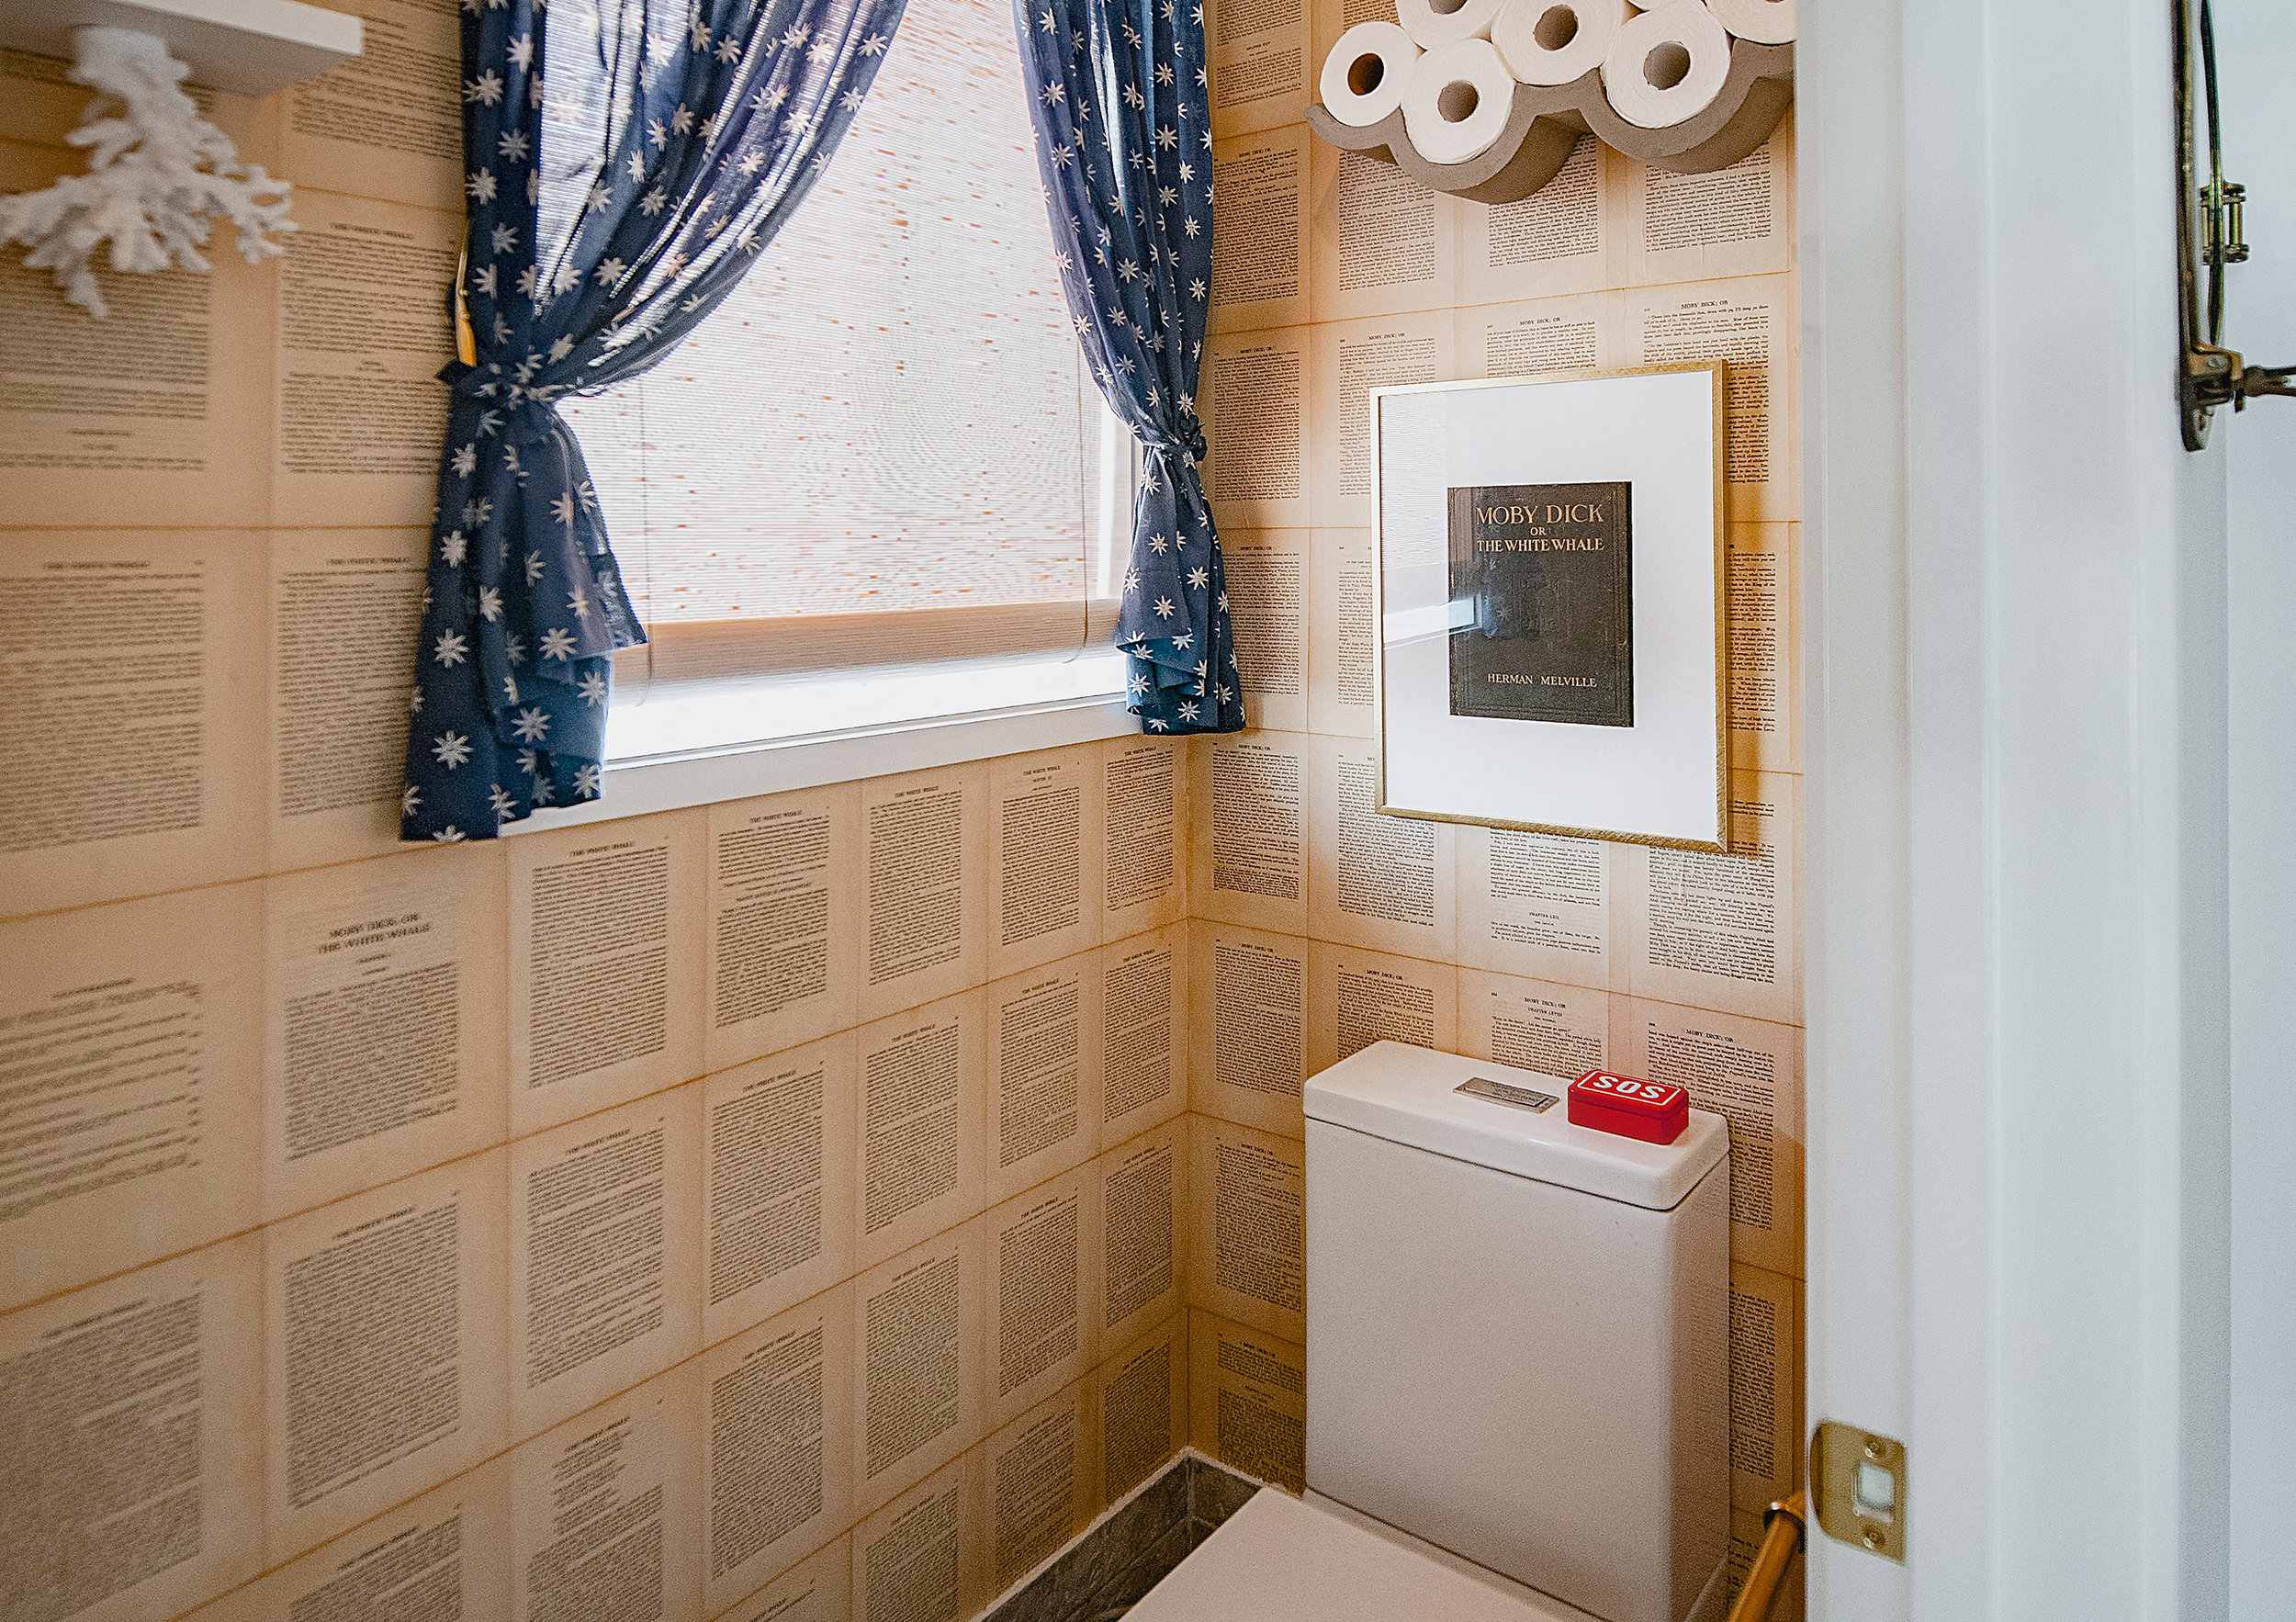 Barellen-13-Guest-Toilet---Upstairs-2018-11-05-12.29.17.jpg